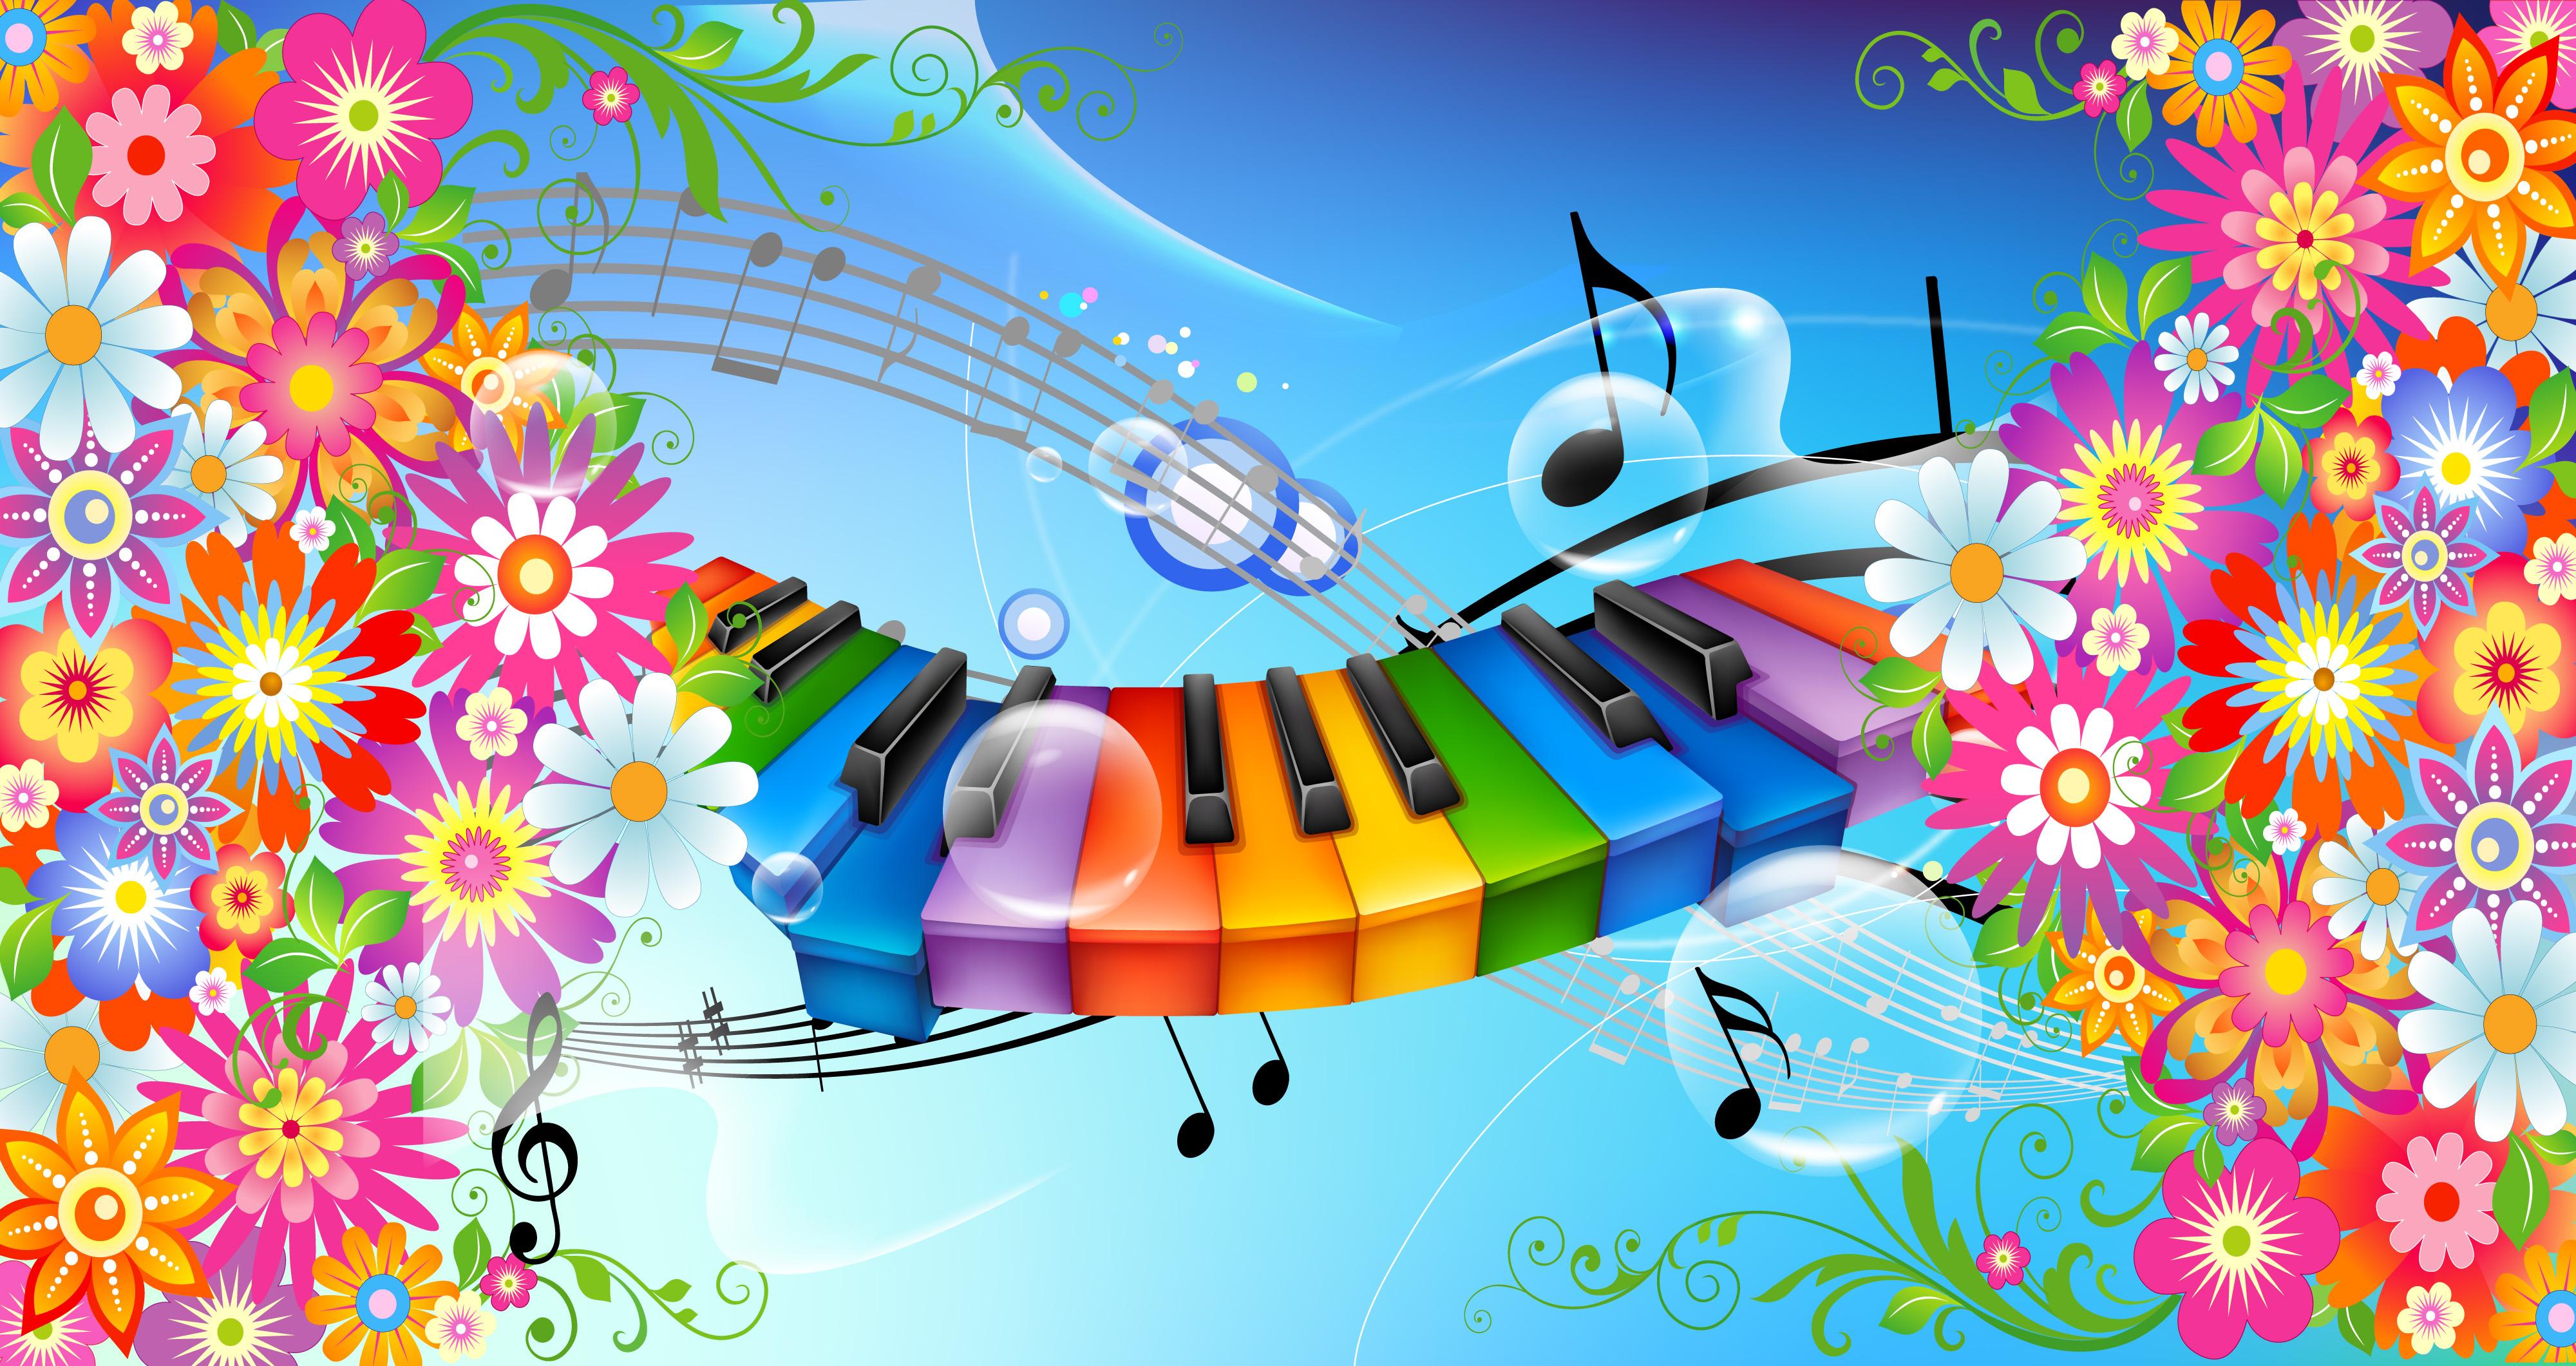 http://orig03.deviantart.net/9487/f/2008/123/6/c/spring_song_by_ghassan747.jpg